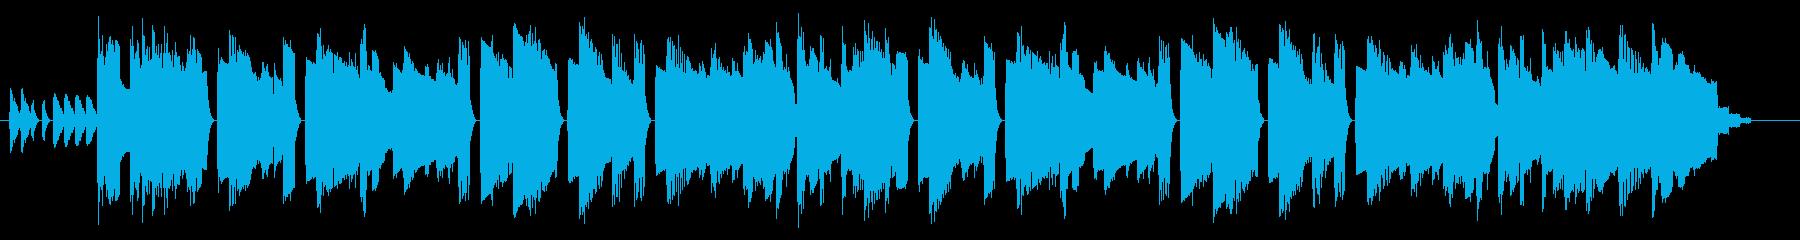 NES アクションD01-2(タイトル2の再生済みの波形